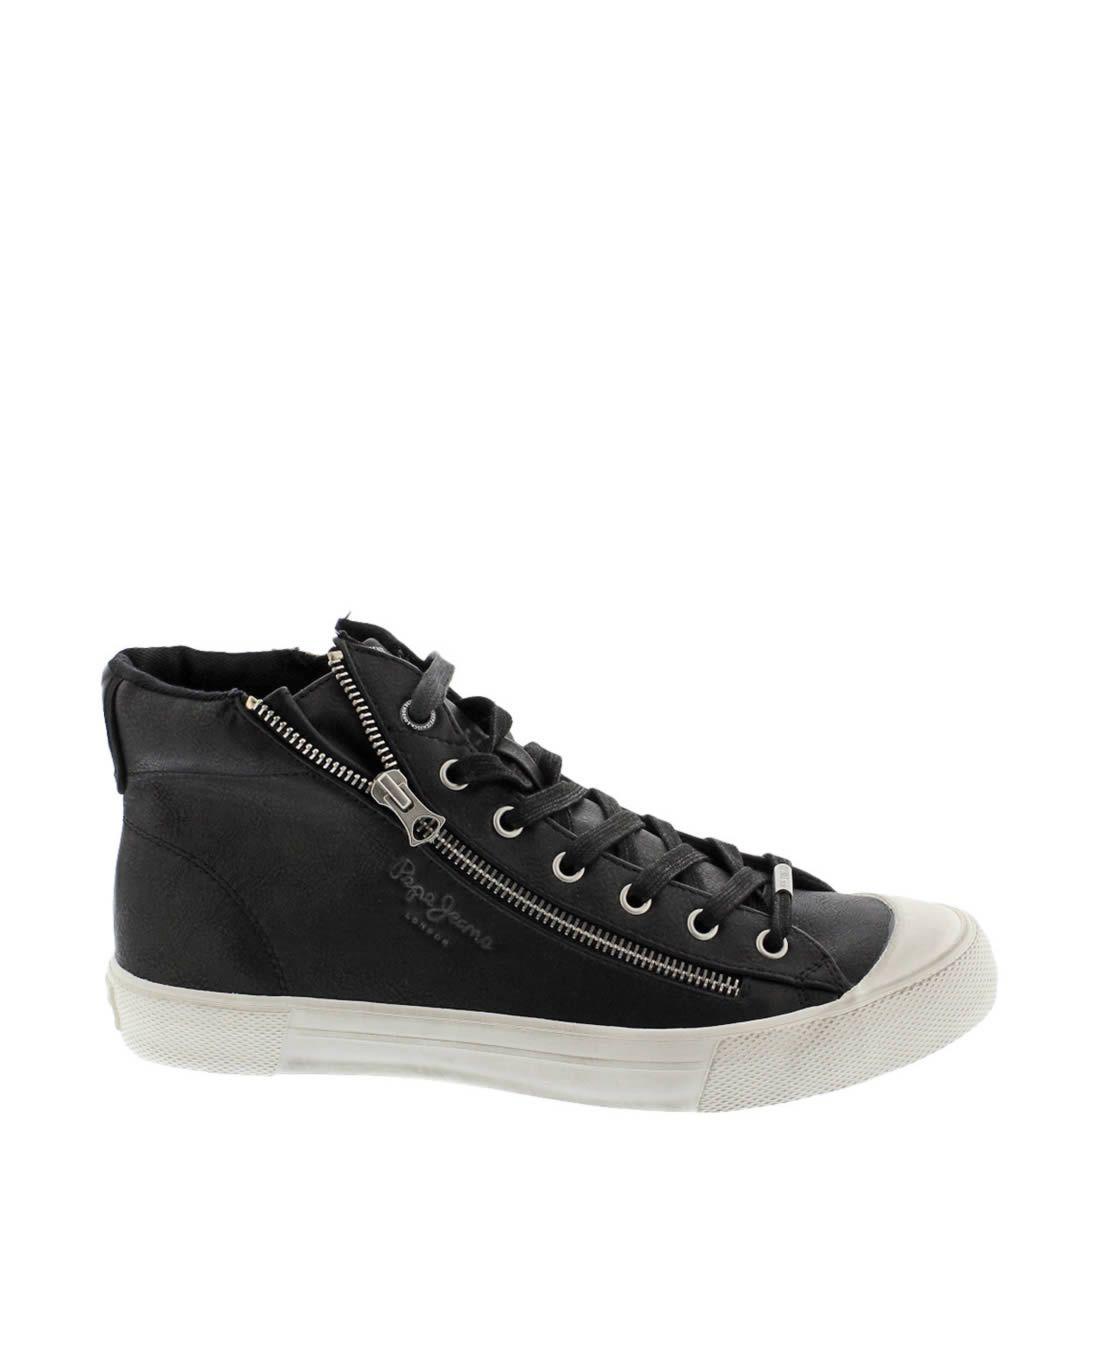 Zapatillas Pms30178 Usaria Ropa Jeans Que Negro Pepe Pinterest 6trwt